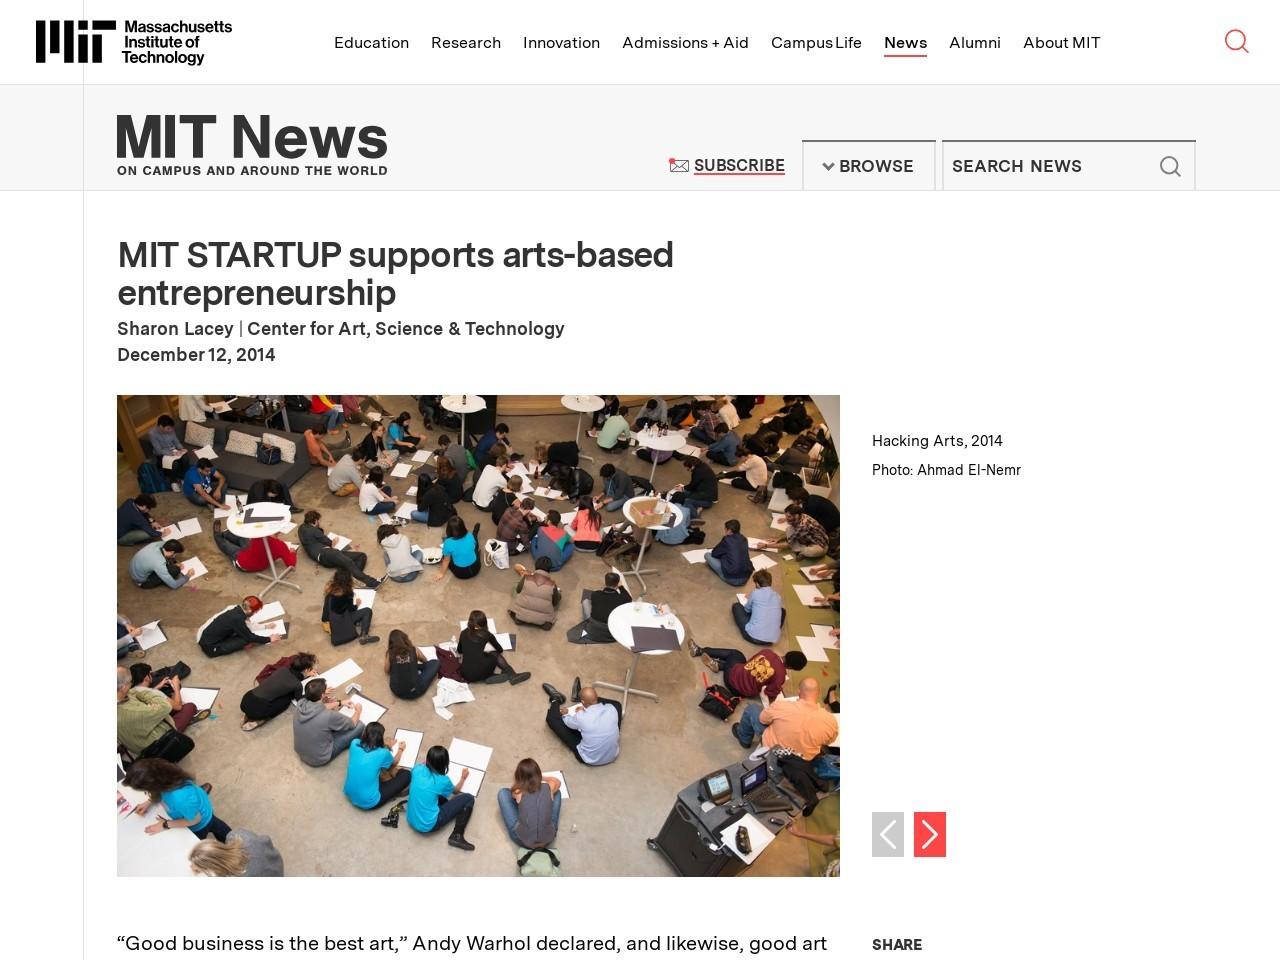 MIT STARTUP supports arts-based entrepreneurship | MIT …